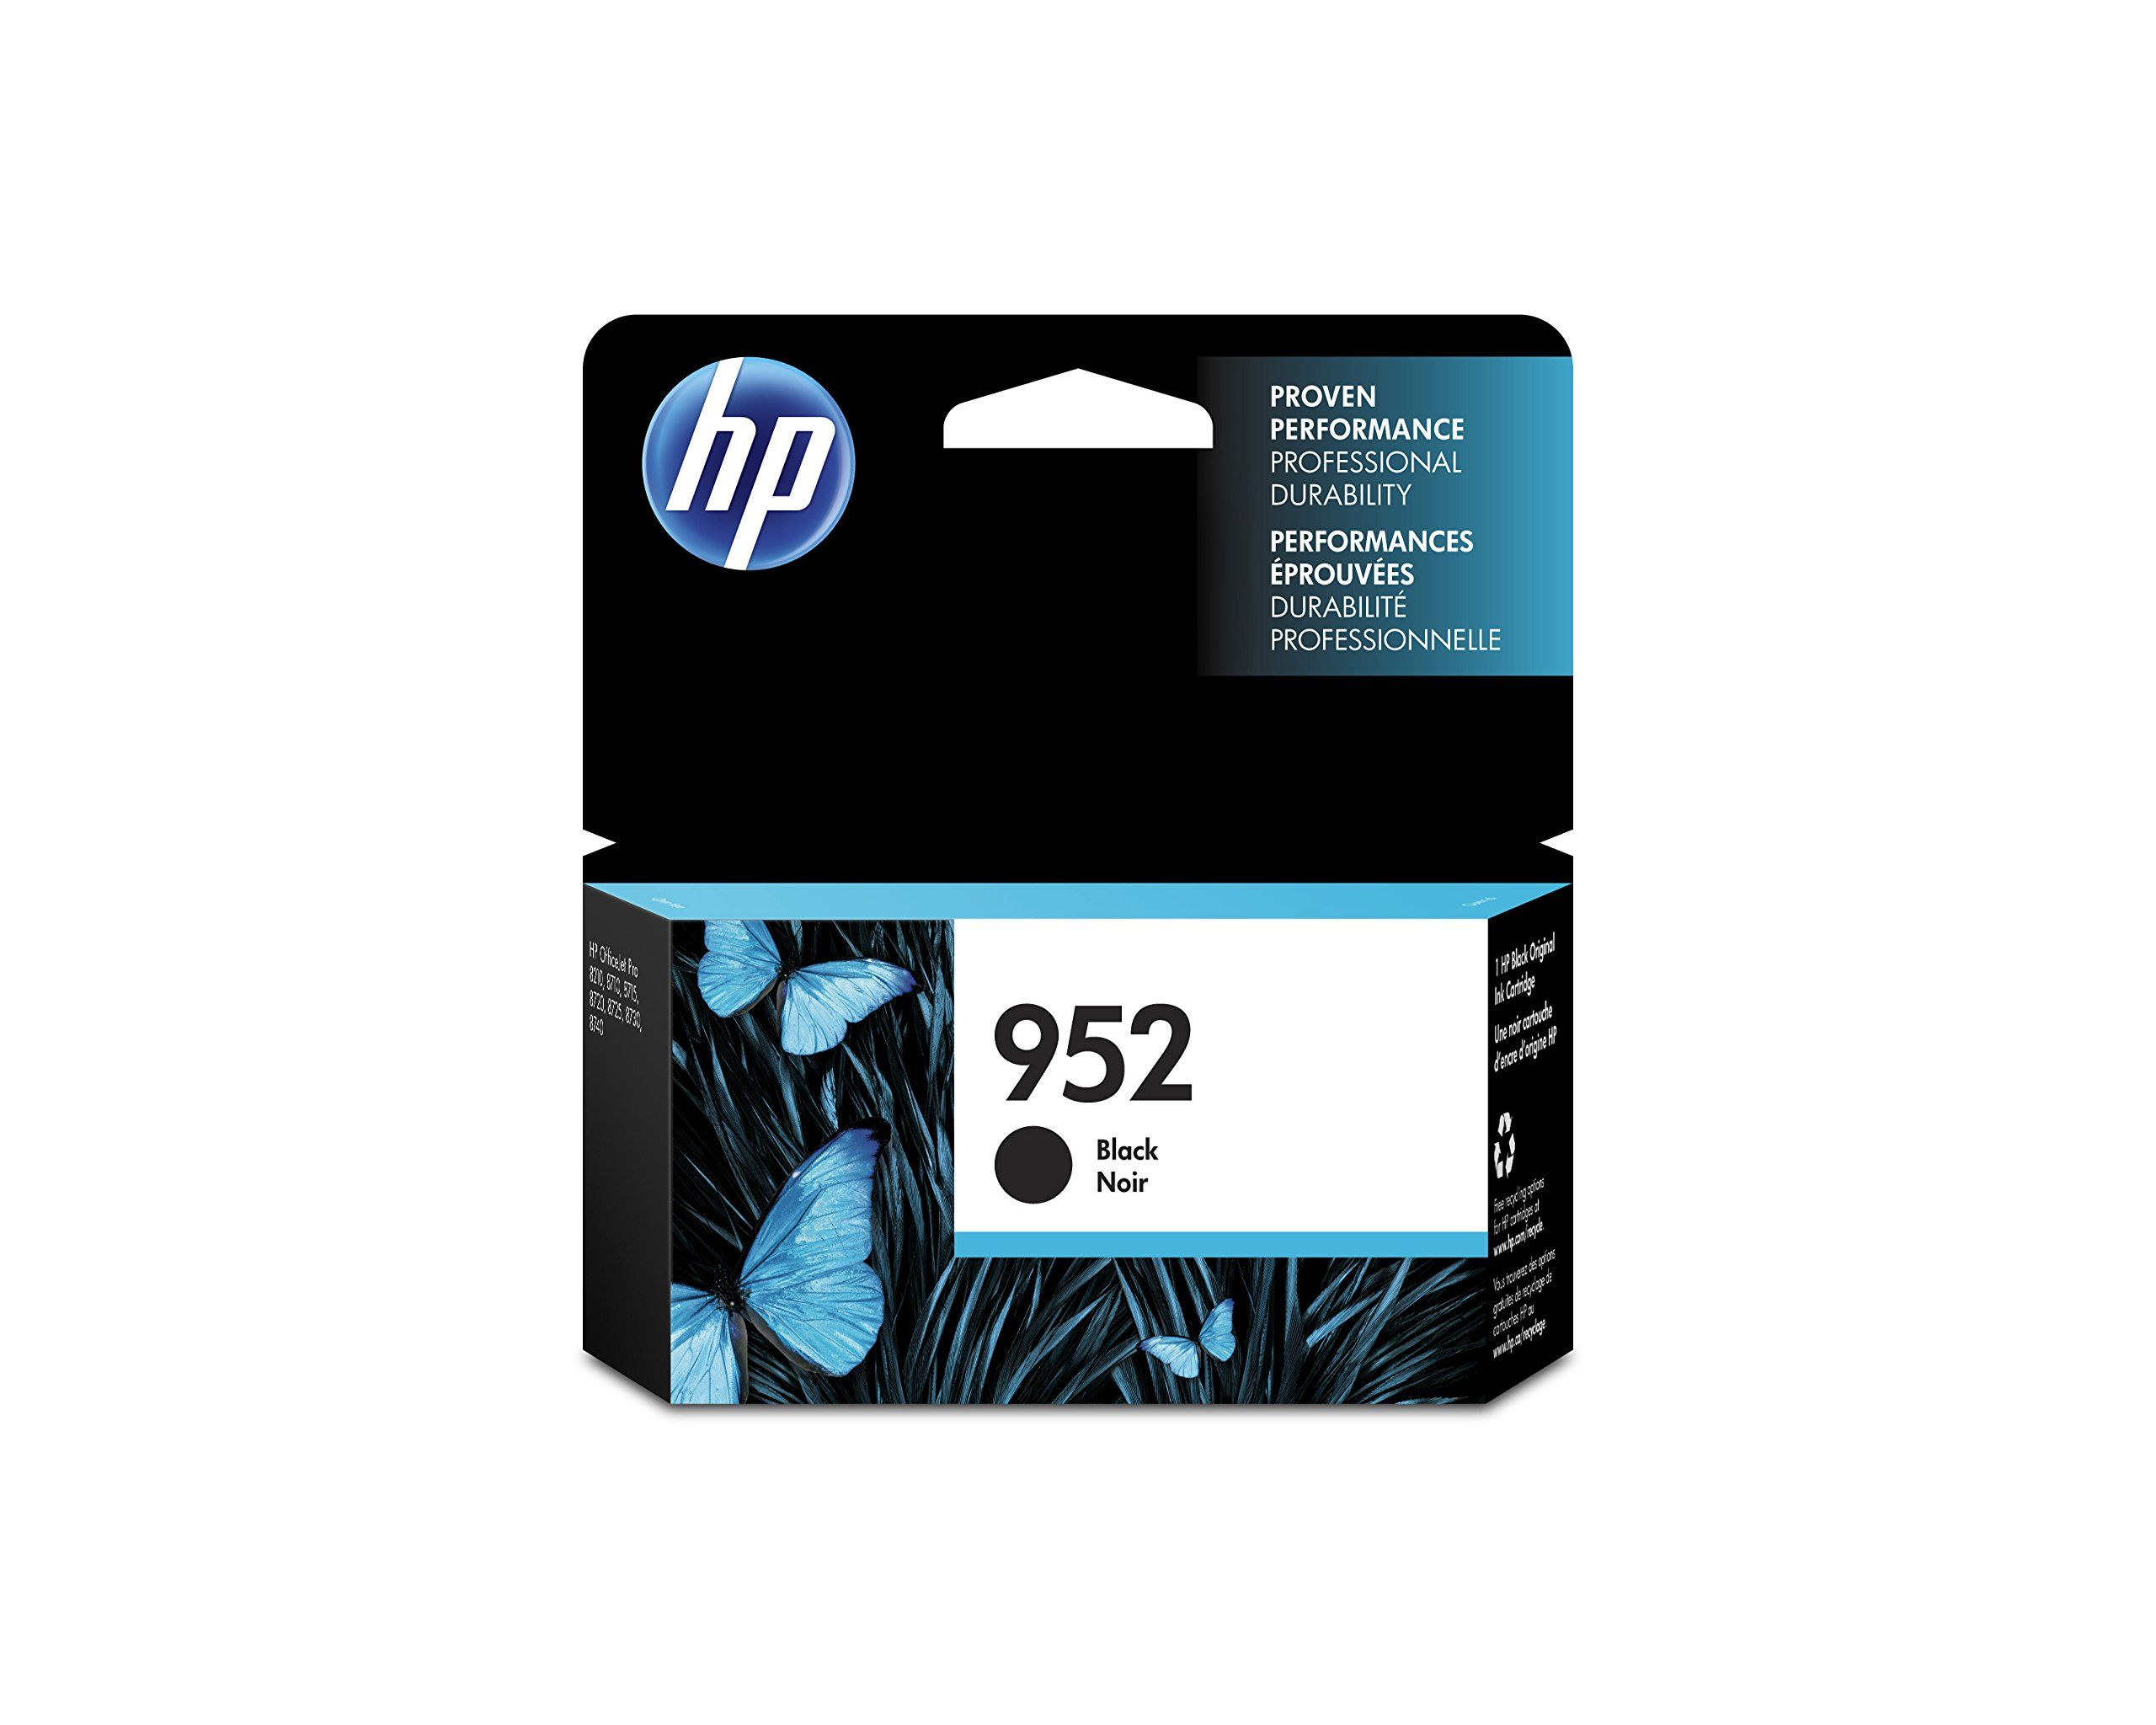 Hp 952 Black Original Ink Cartridge F6u15an For Hp Officejet Pro 7740 8702 8710 8715 8720 8725 8730 874 Printer Ink Cartridges Inkjet